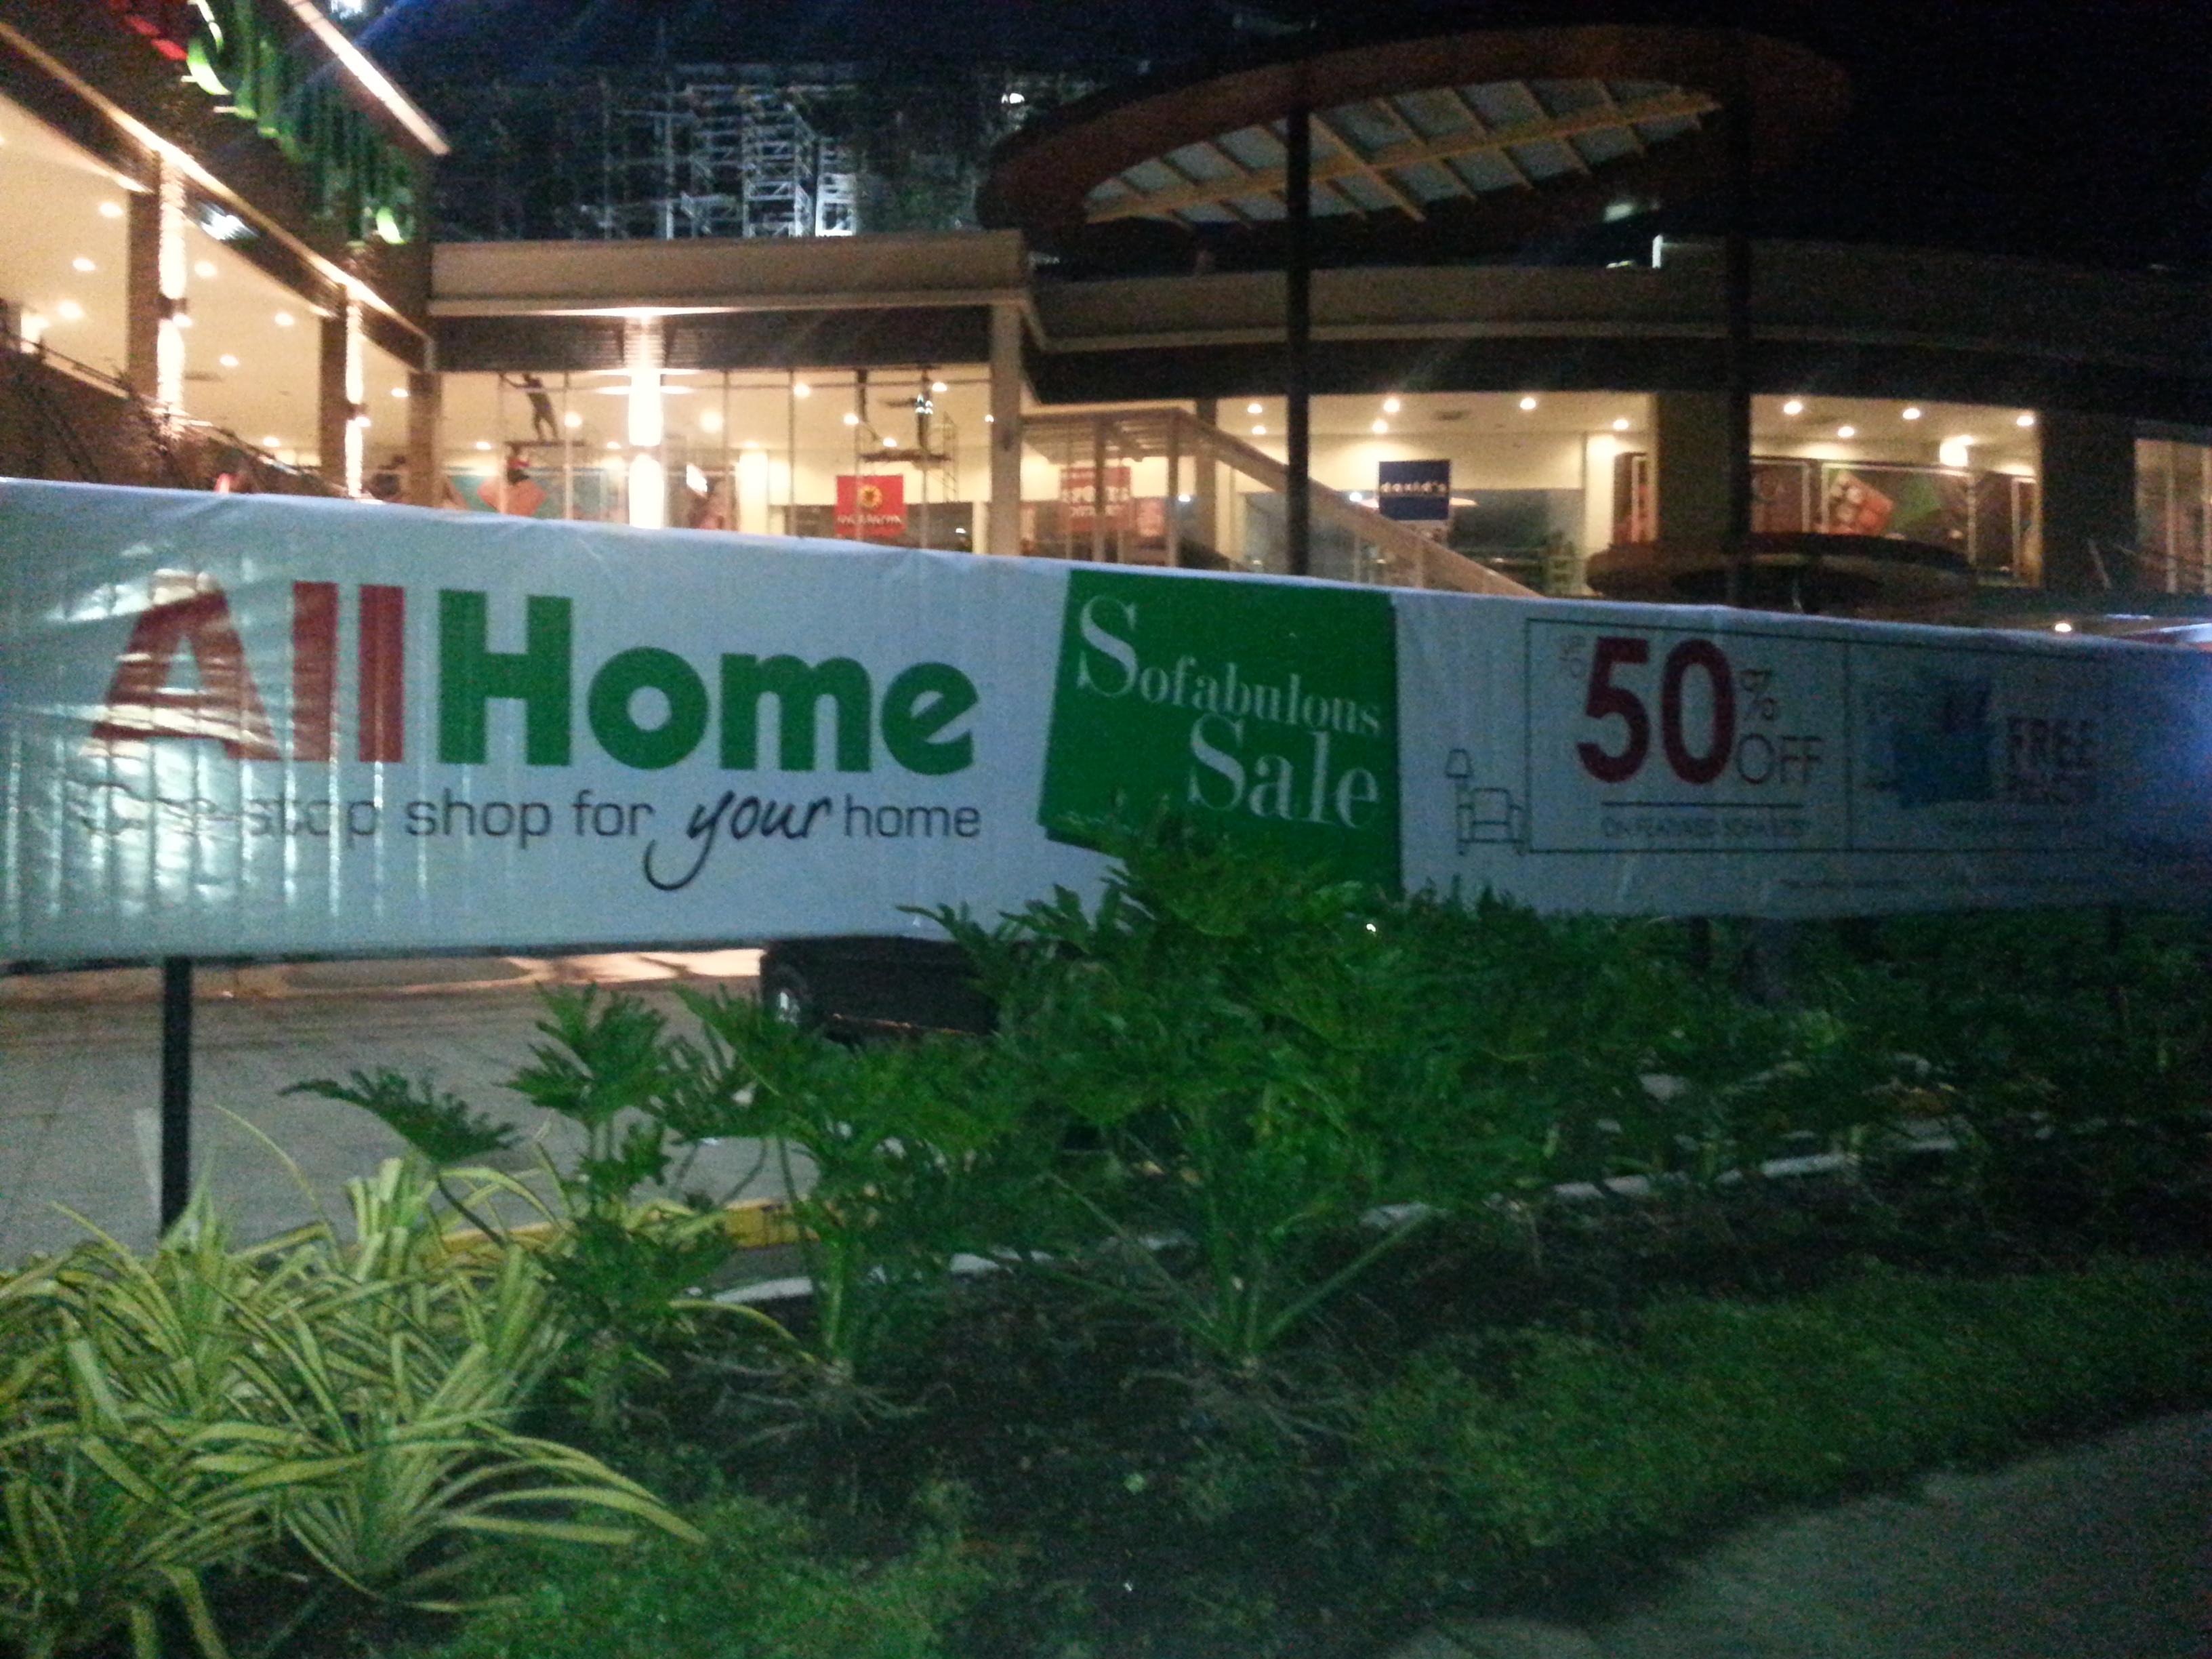 All Home Sofabulous Sale Streamer